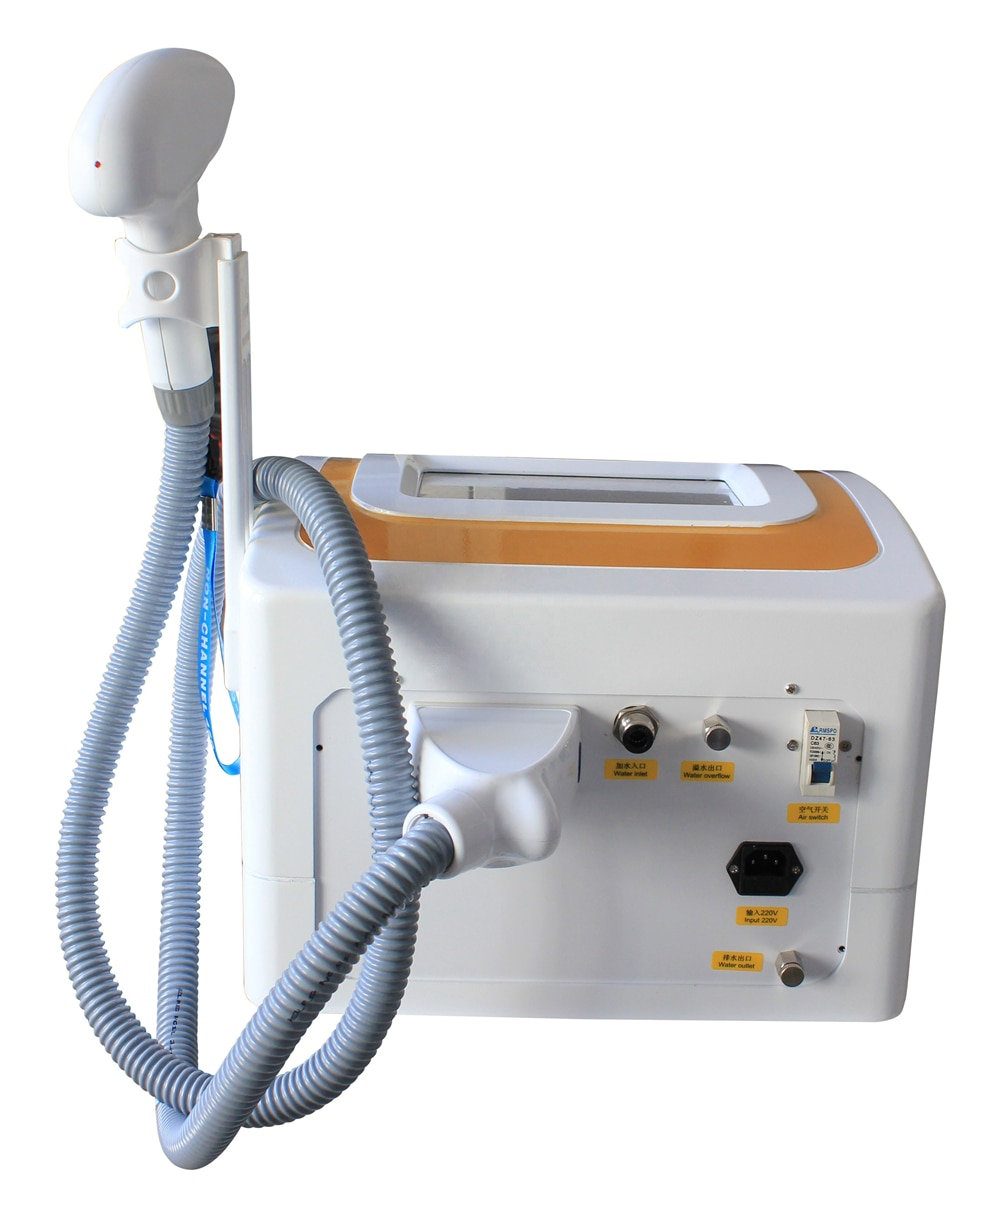 Купить с кэшбэком 2021 Newest Real 600W hair removal laser 755nm/808nm/1064nm three wavelenth 808nm diode laser hair removal machine With CE